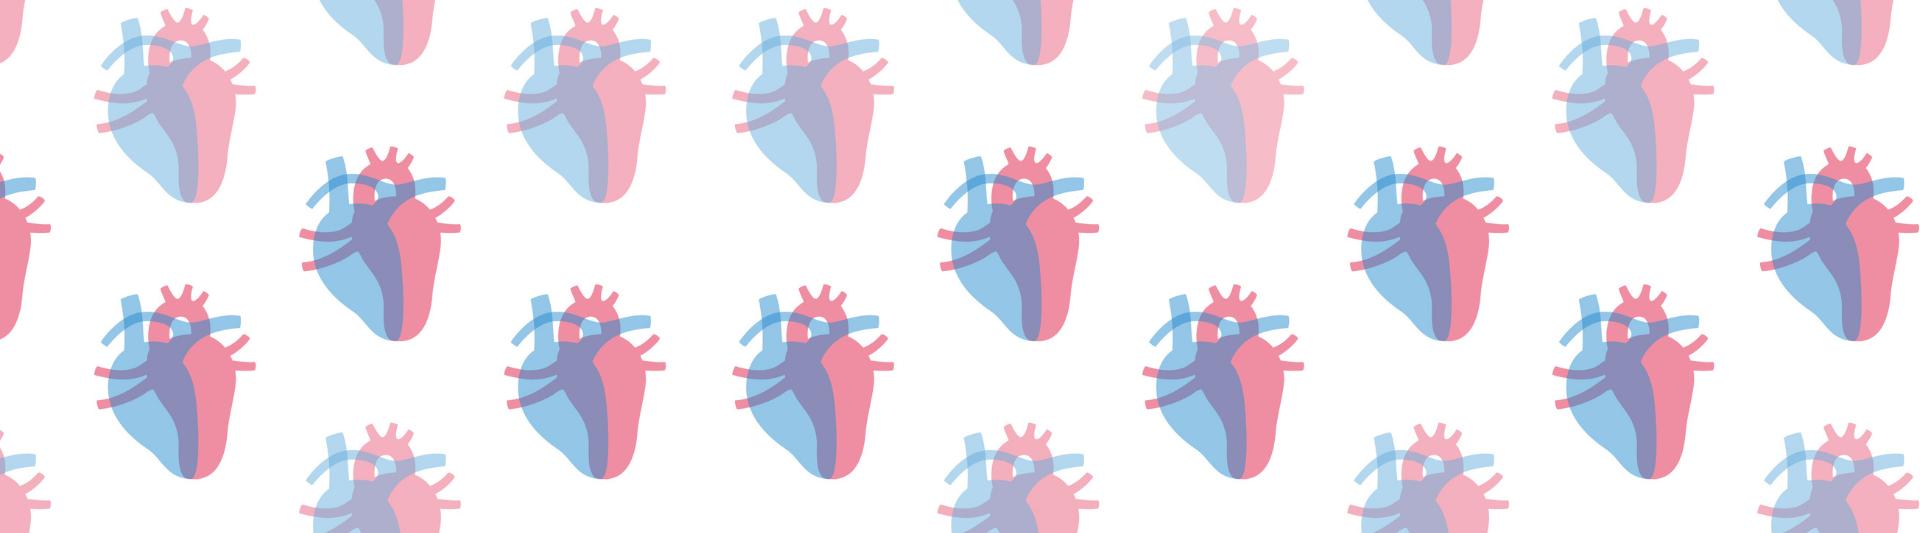 Monthly Cardiovascular Forum:  May 24, 2021, Webinar Recording